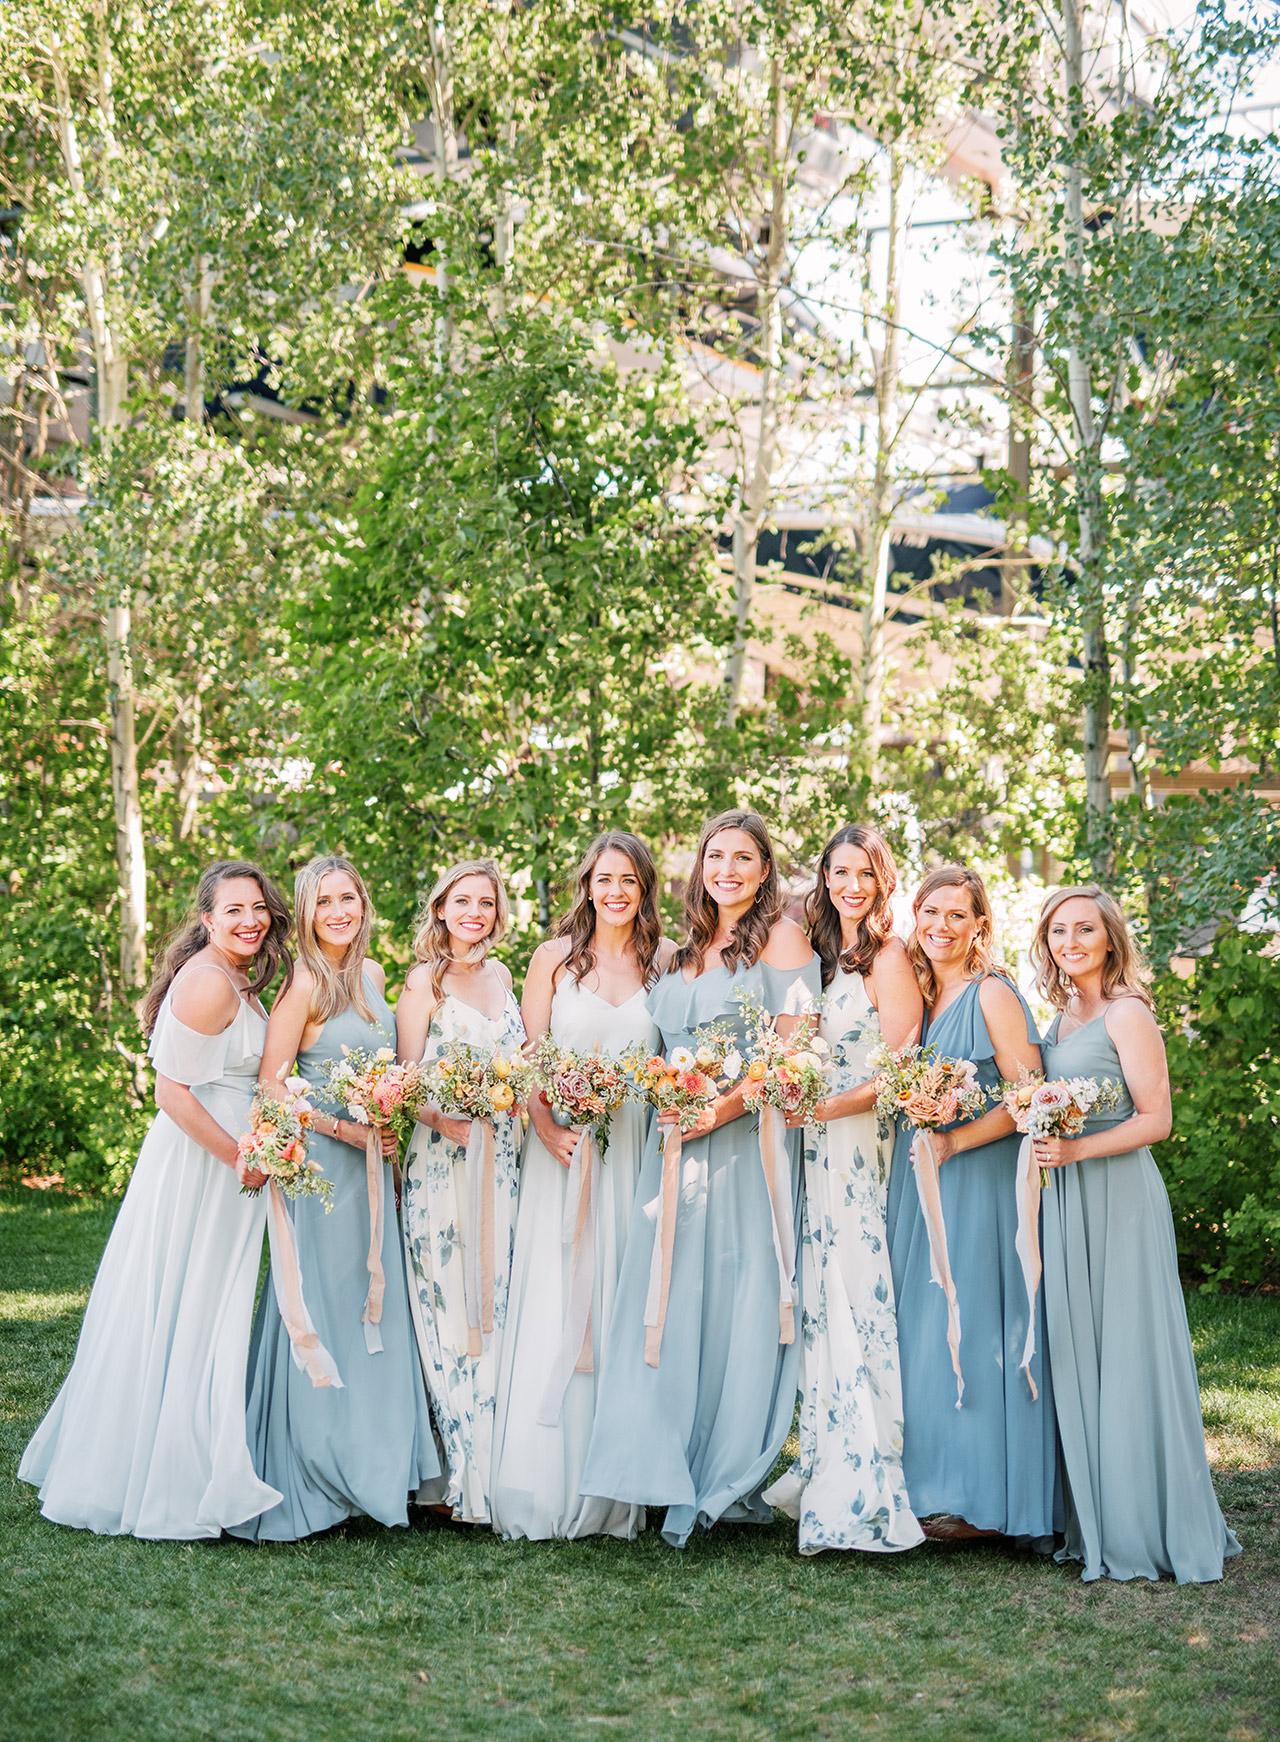 bride bridesmaids light blue dresses outdoors